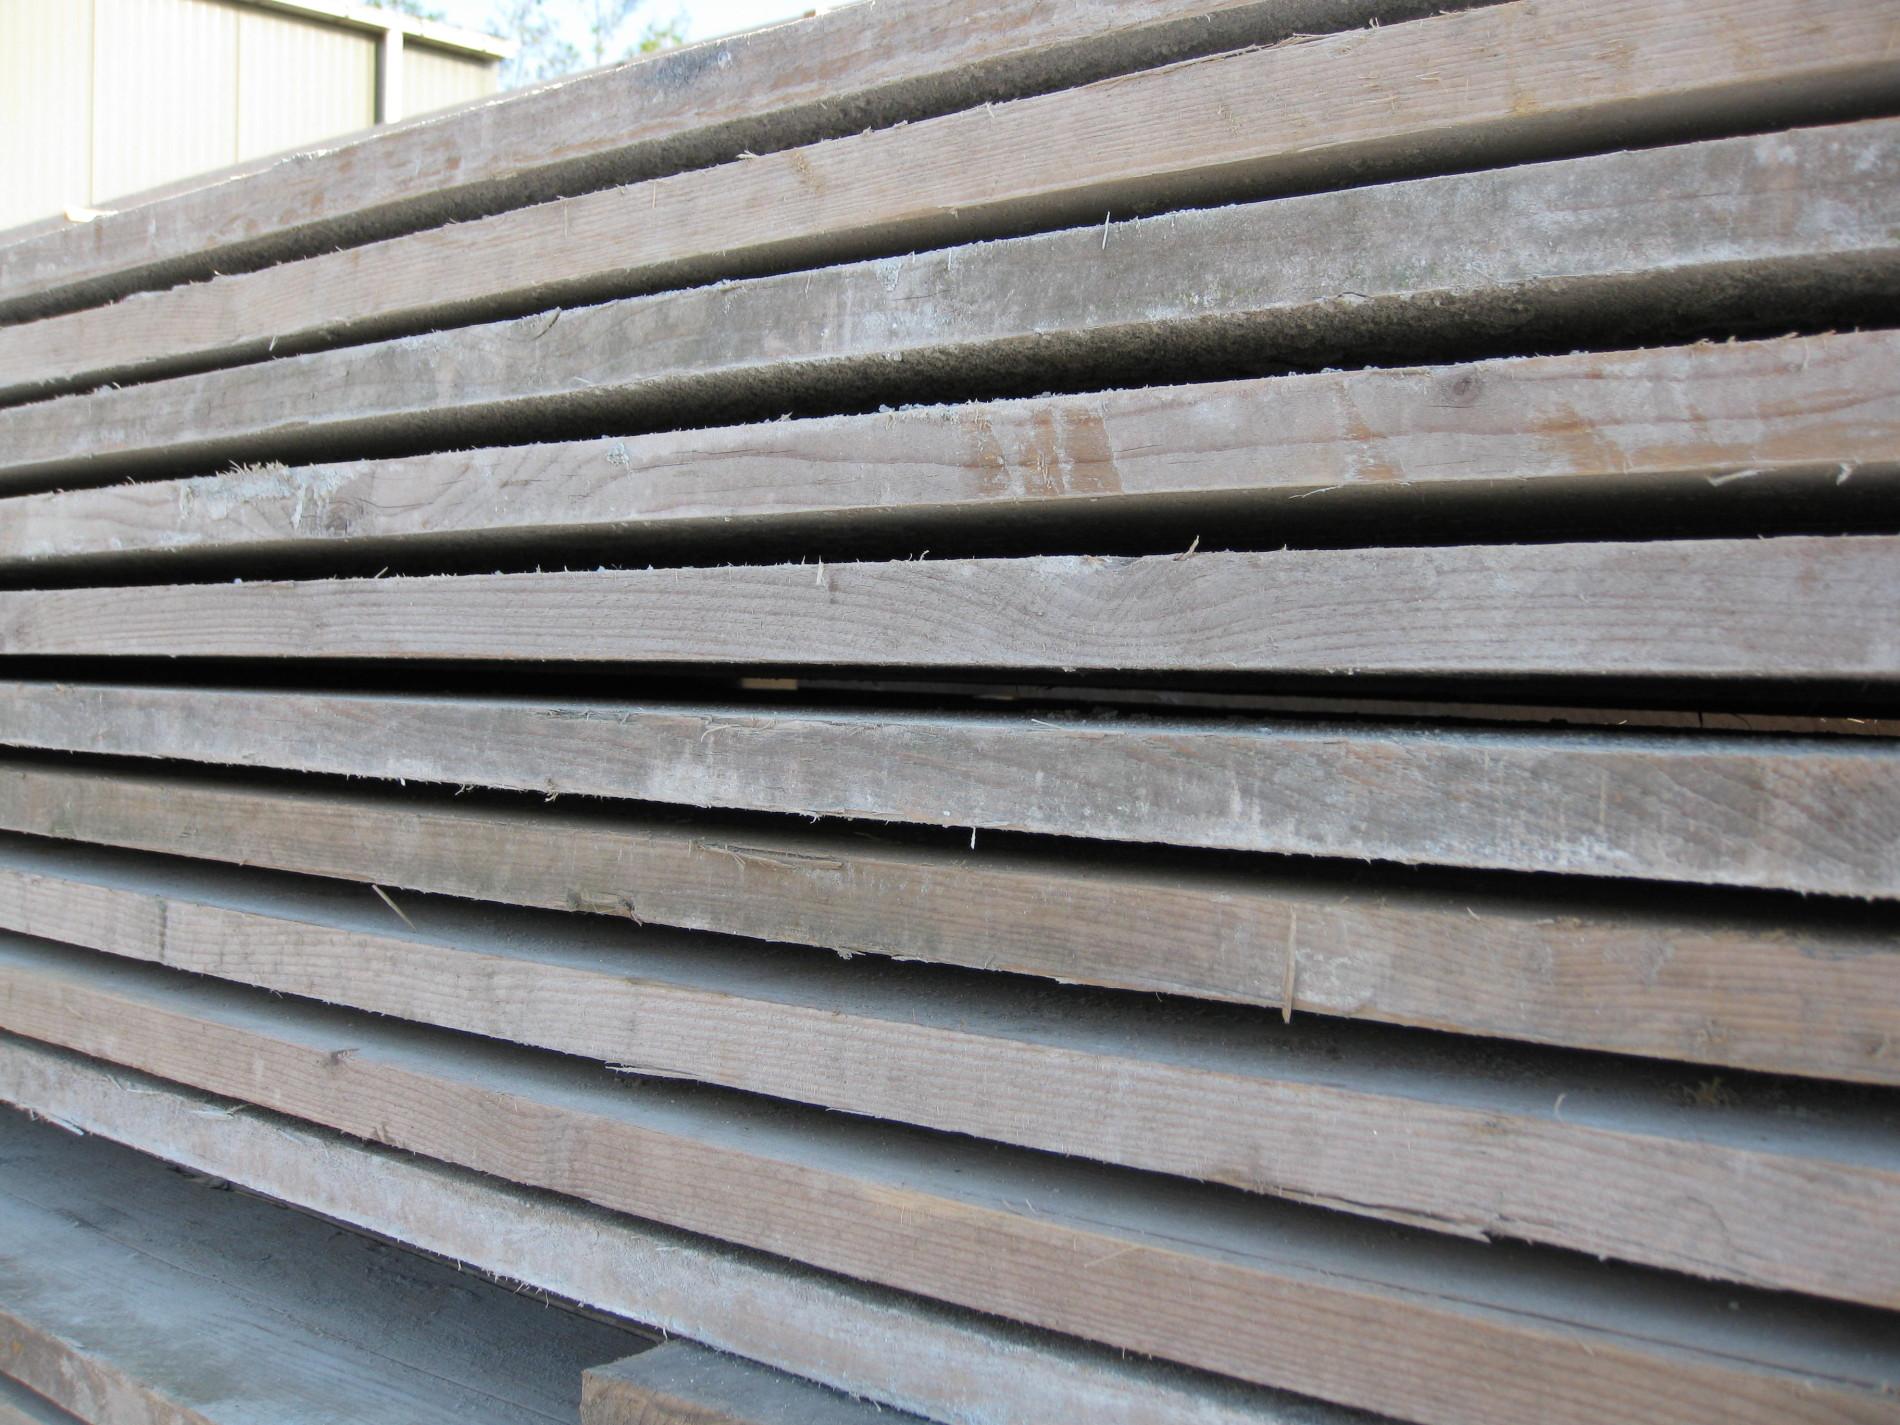 Steigerhout Meubels Barendrecht : Meubelen van steigerhout van hout zo